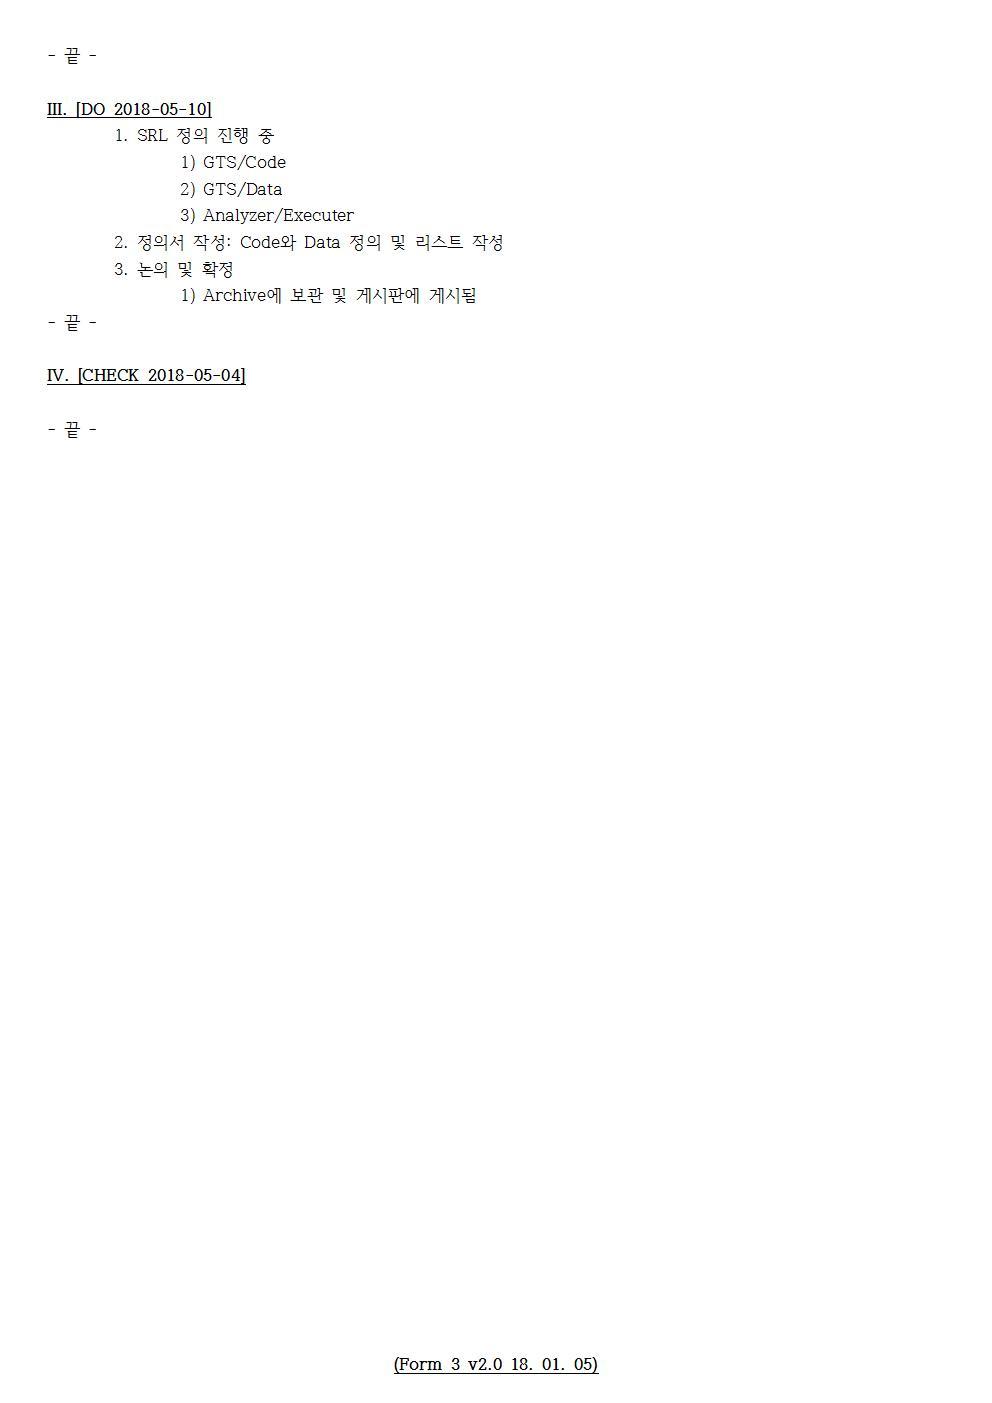 D-[18-001-RD-01]-[SAVE 3.0]-[2018-05-10][SH]002.jpg